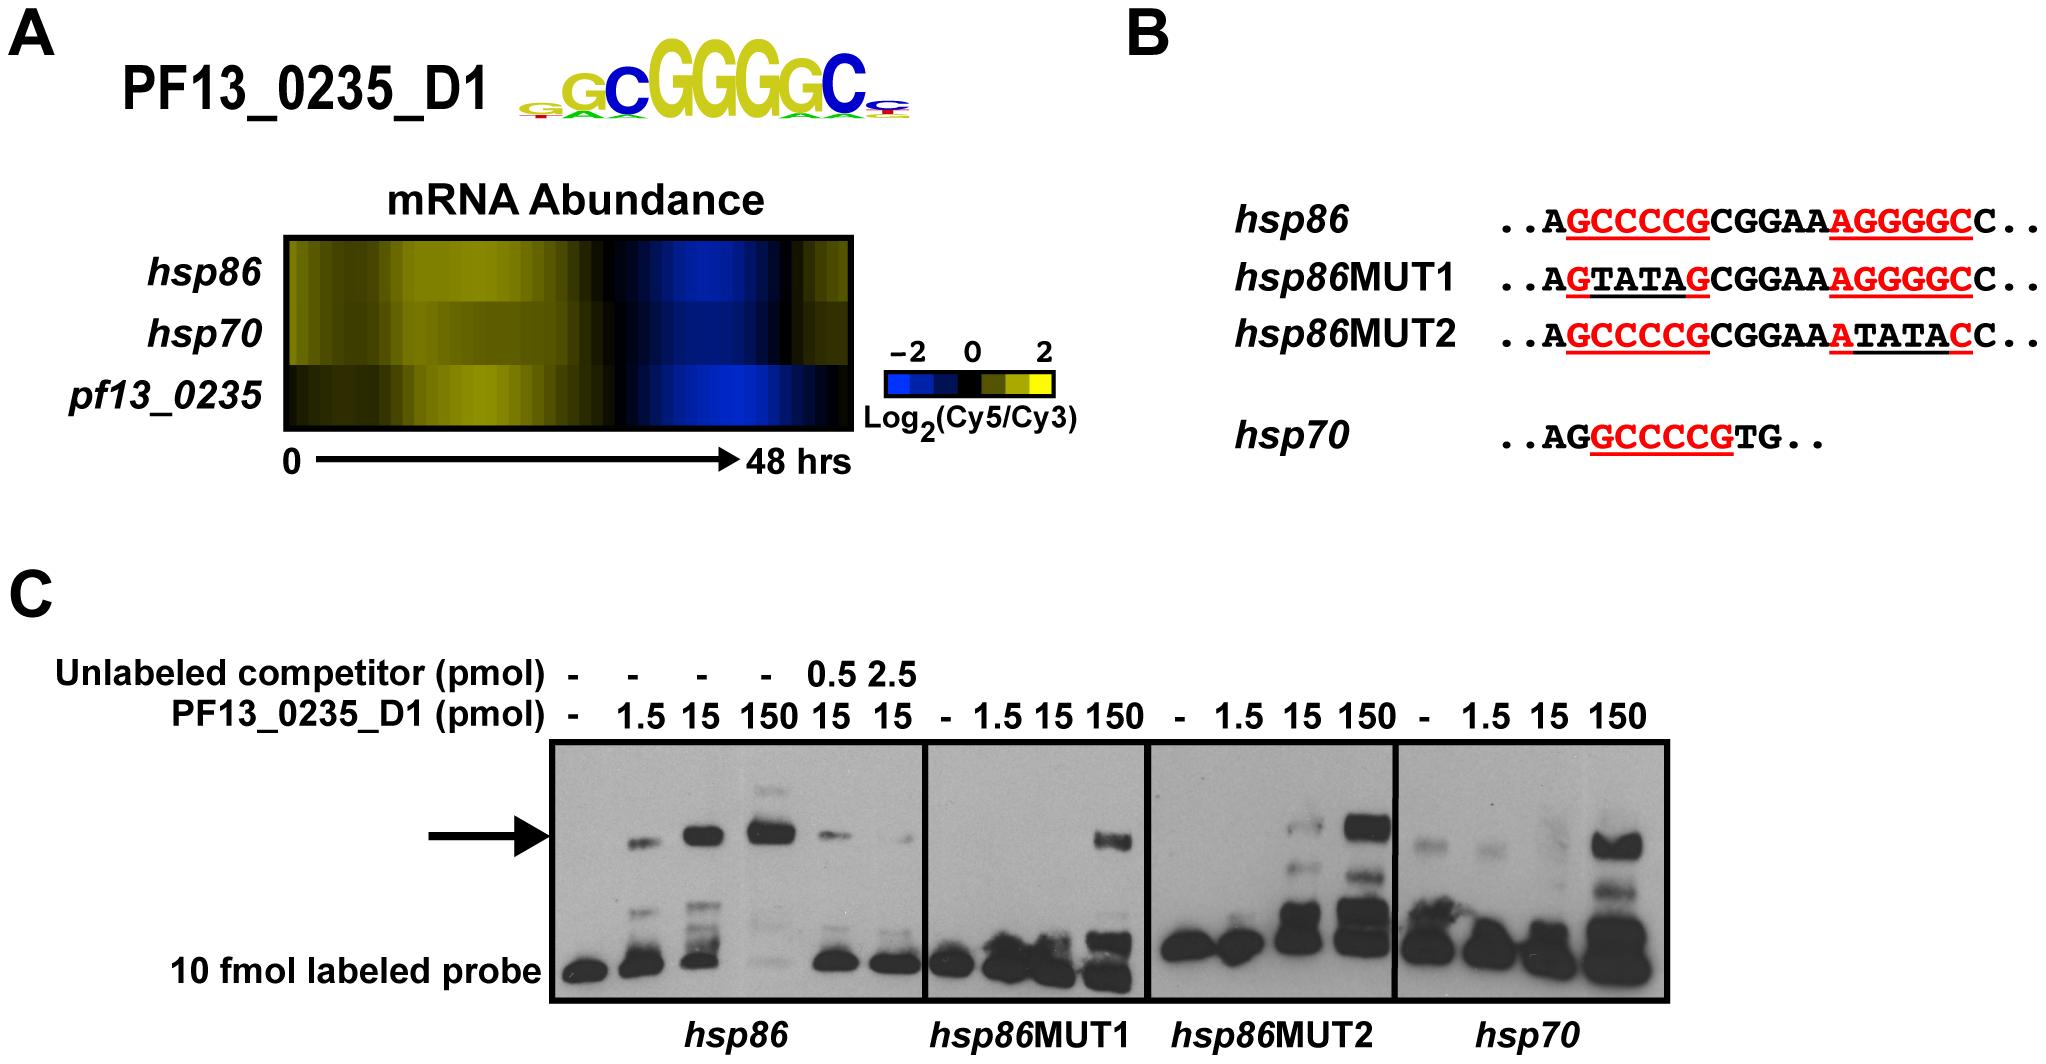 PF13_0235_D1 binds the G-box and is a putative regulator of heat shock genes.